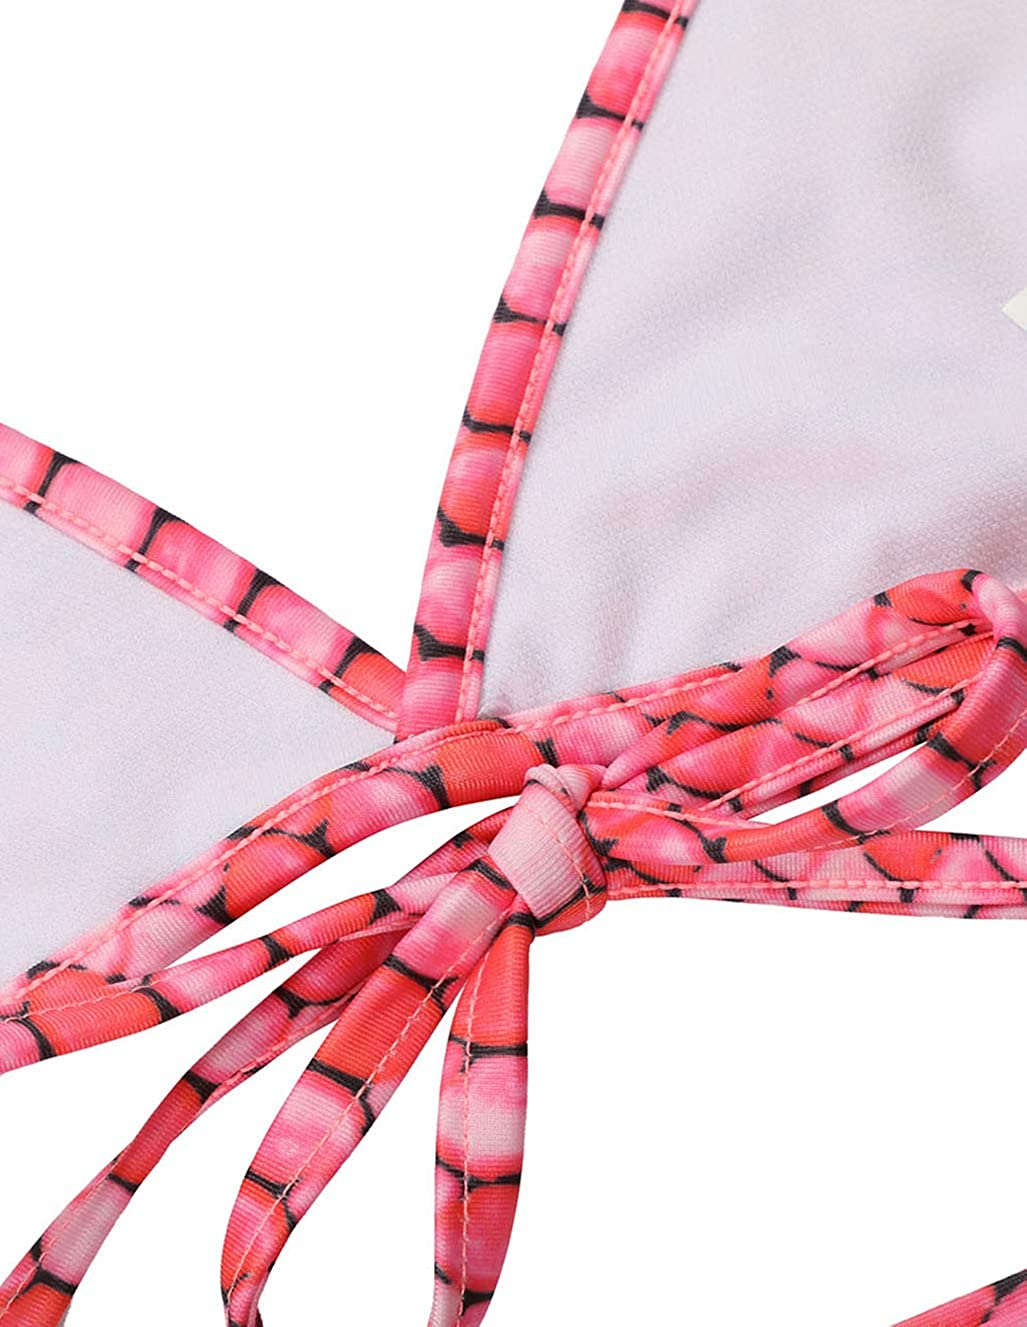 No Monofin LEINASEN 3 Pcs Girls Swimsuits Mermaid Tails Kids Princess Swimming Bikini Bathing Suit Set for 5-14Y